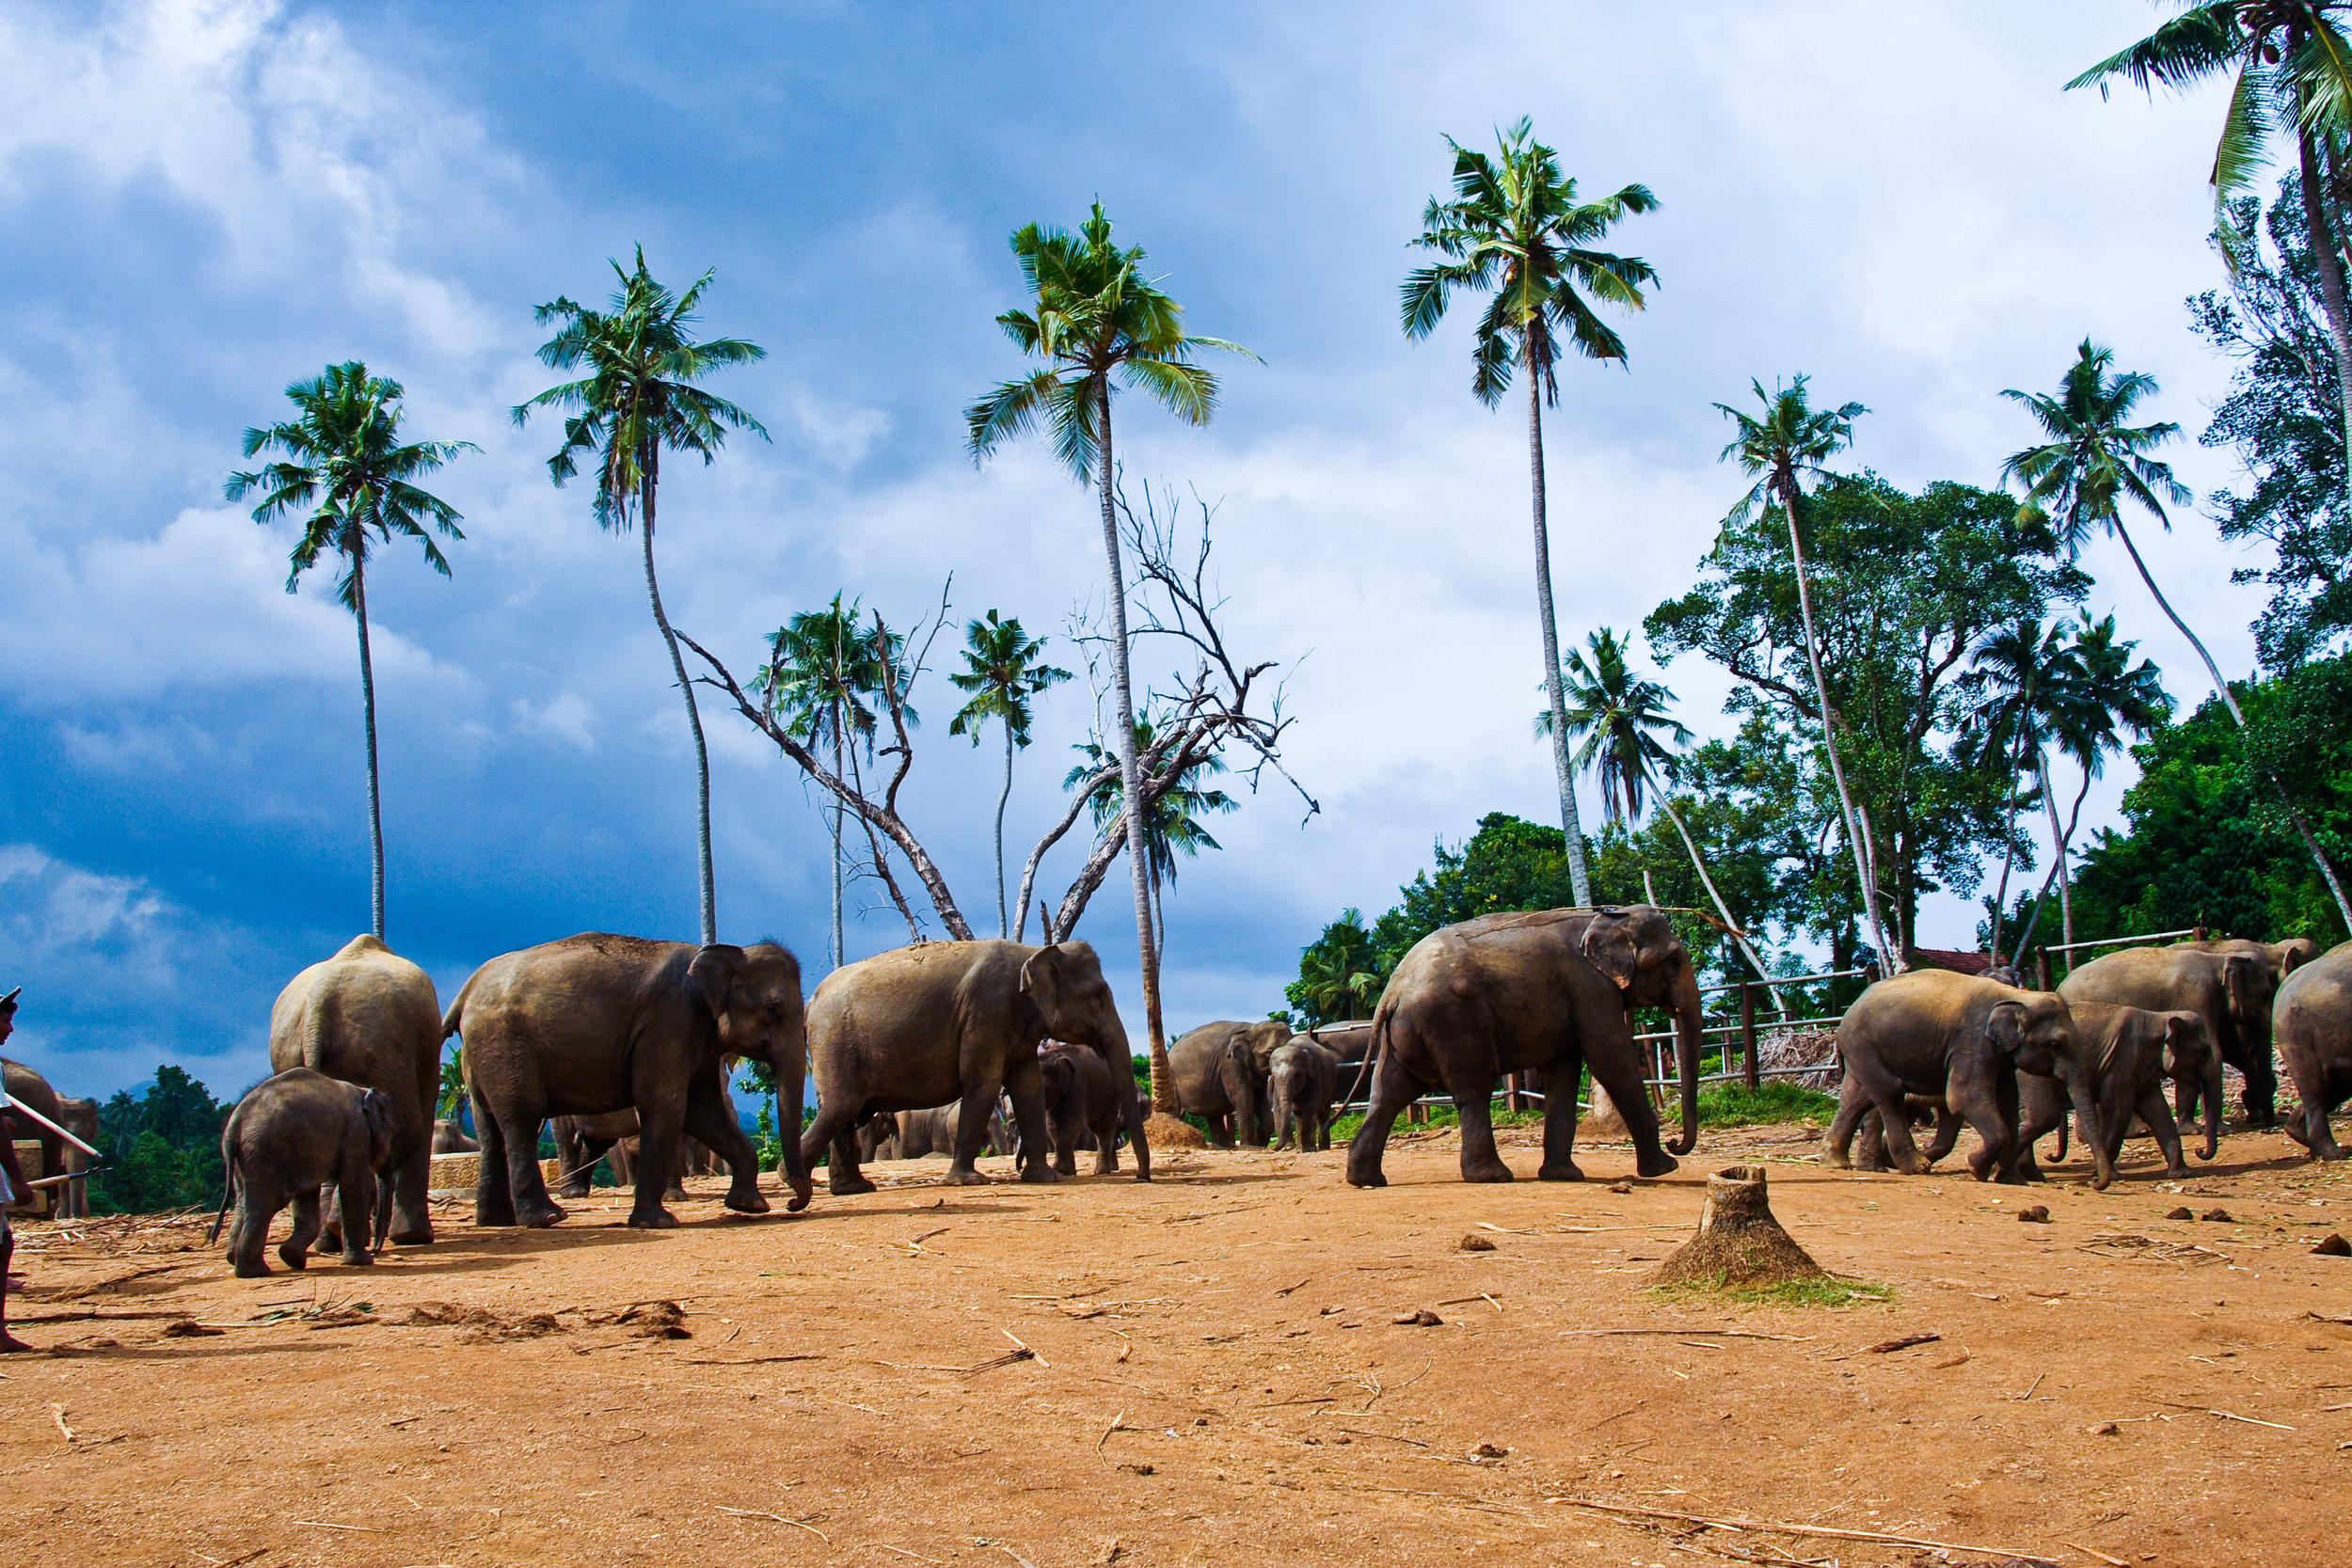 pinnawala-elephant-orphanage-sri-lanka-invite-to-paradise-jungle.jpg